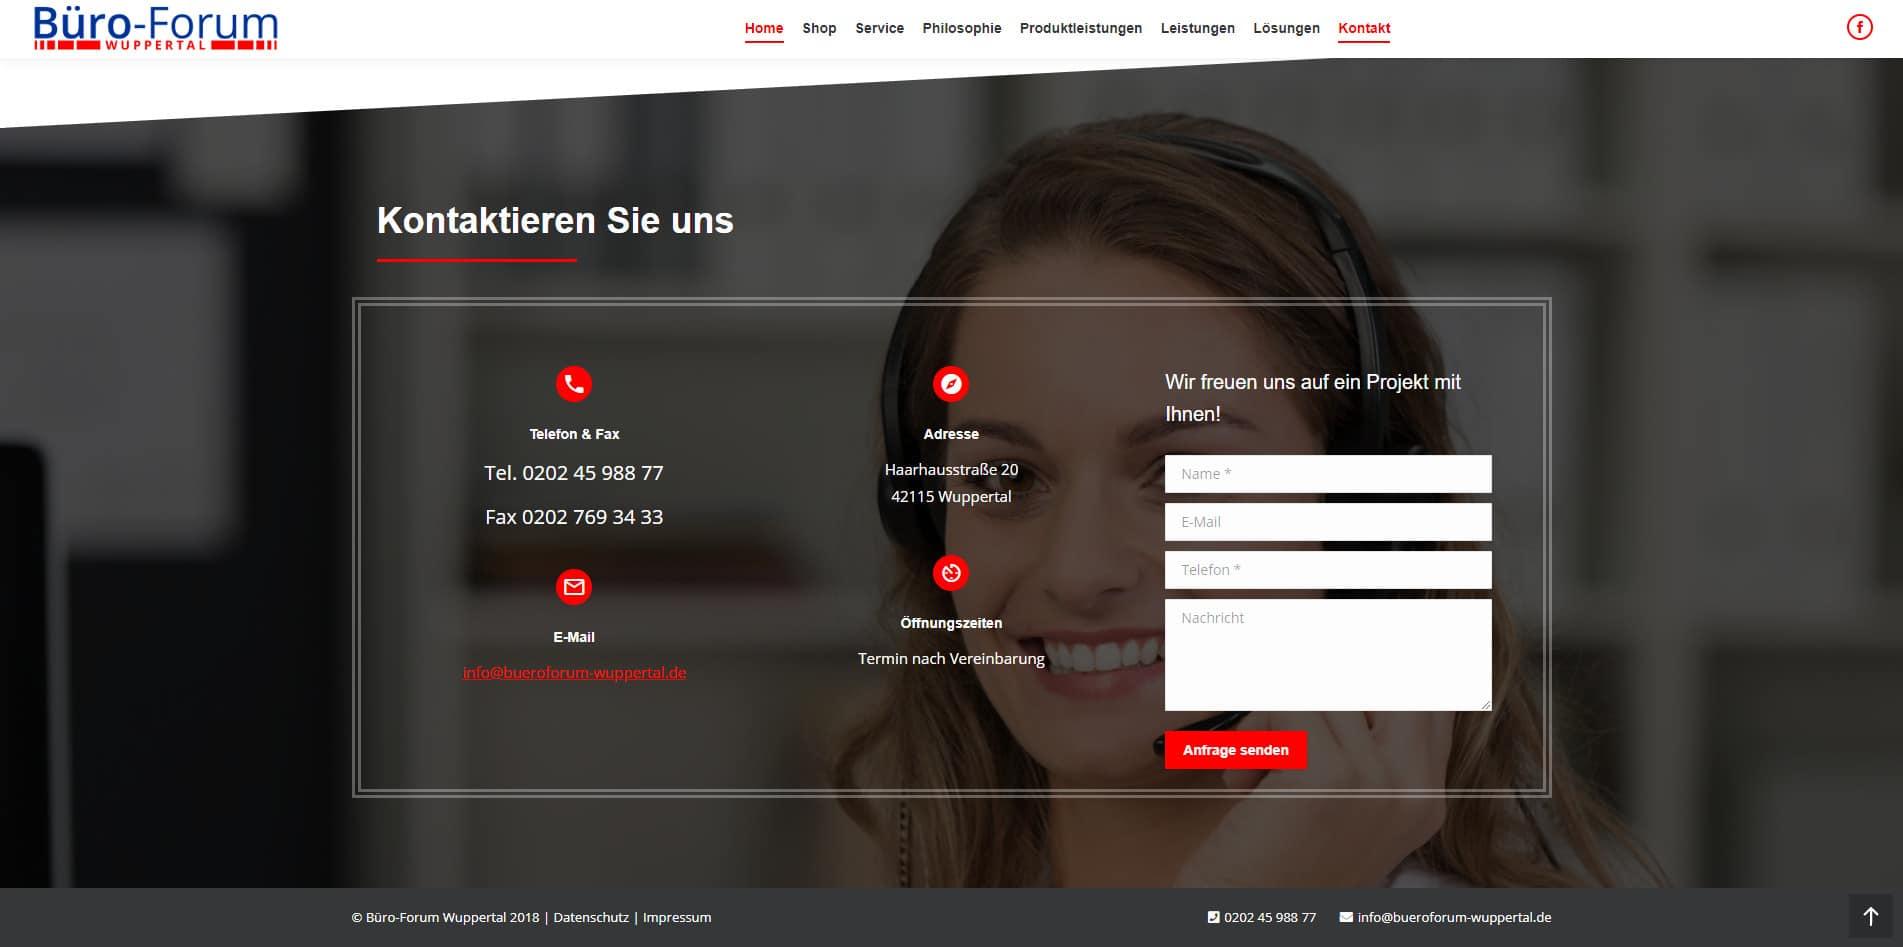 WordPress Website Büro-Forum Wuppertal